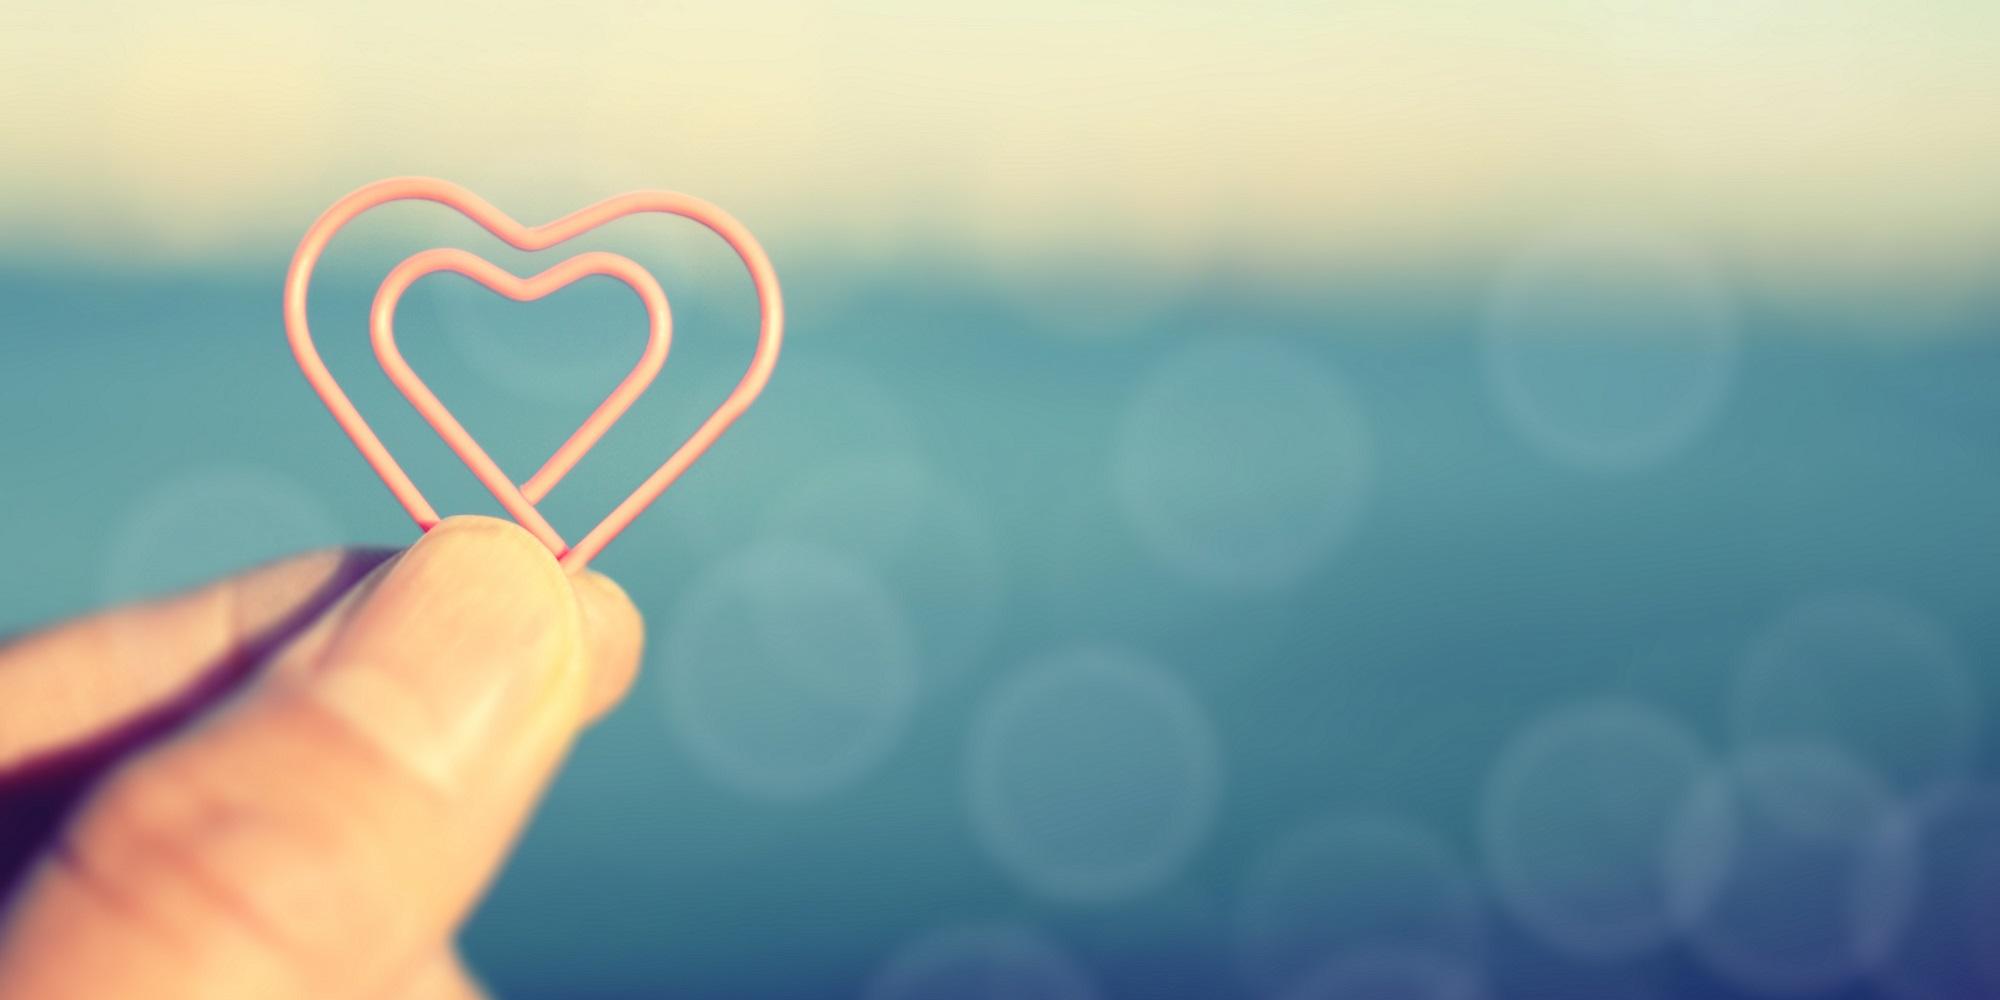 grab the Heart.retro photo image.